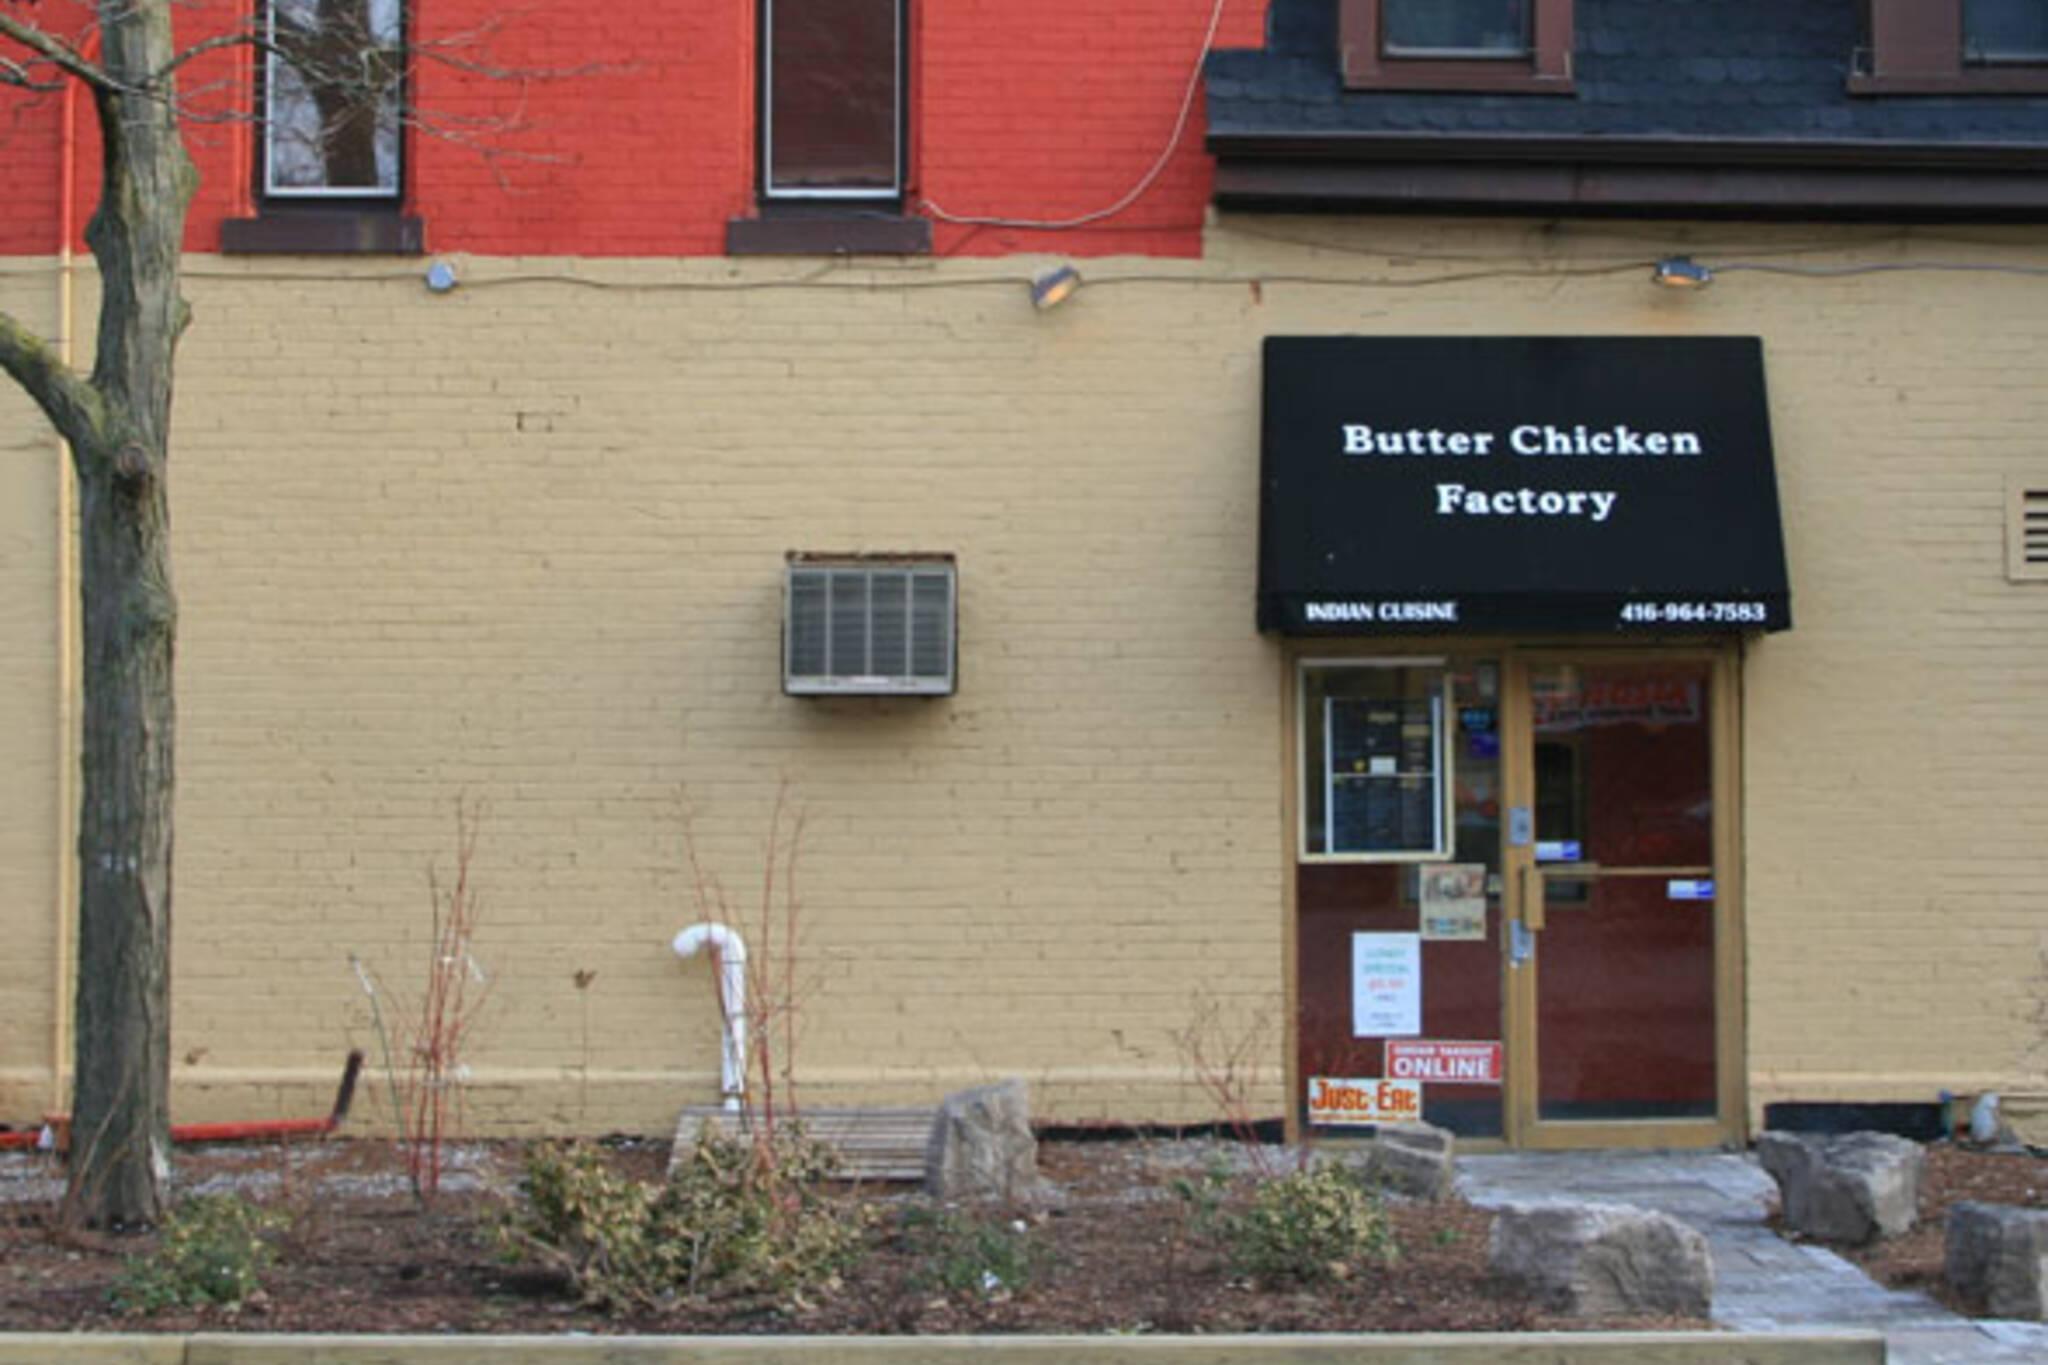 The Butter Chicken Factory